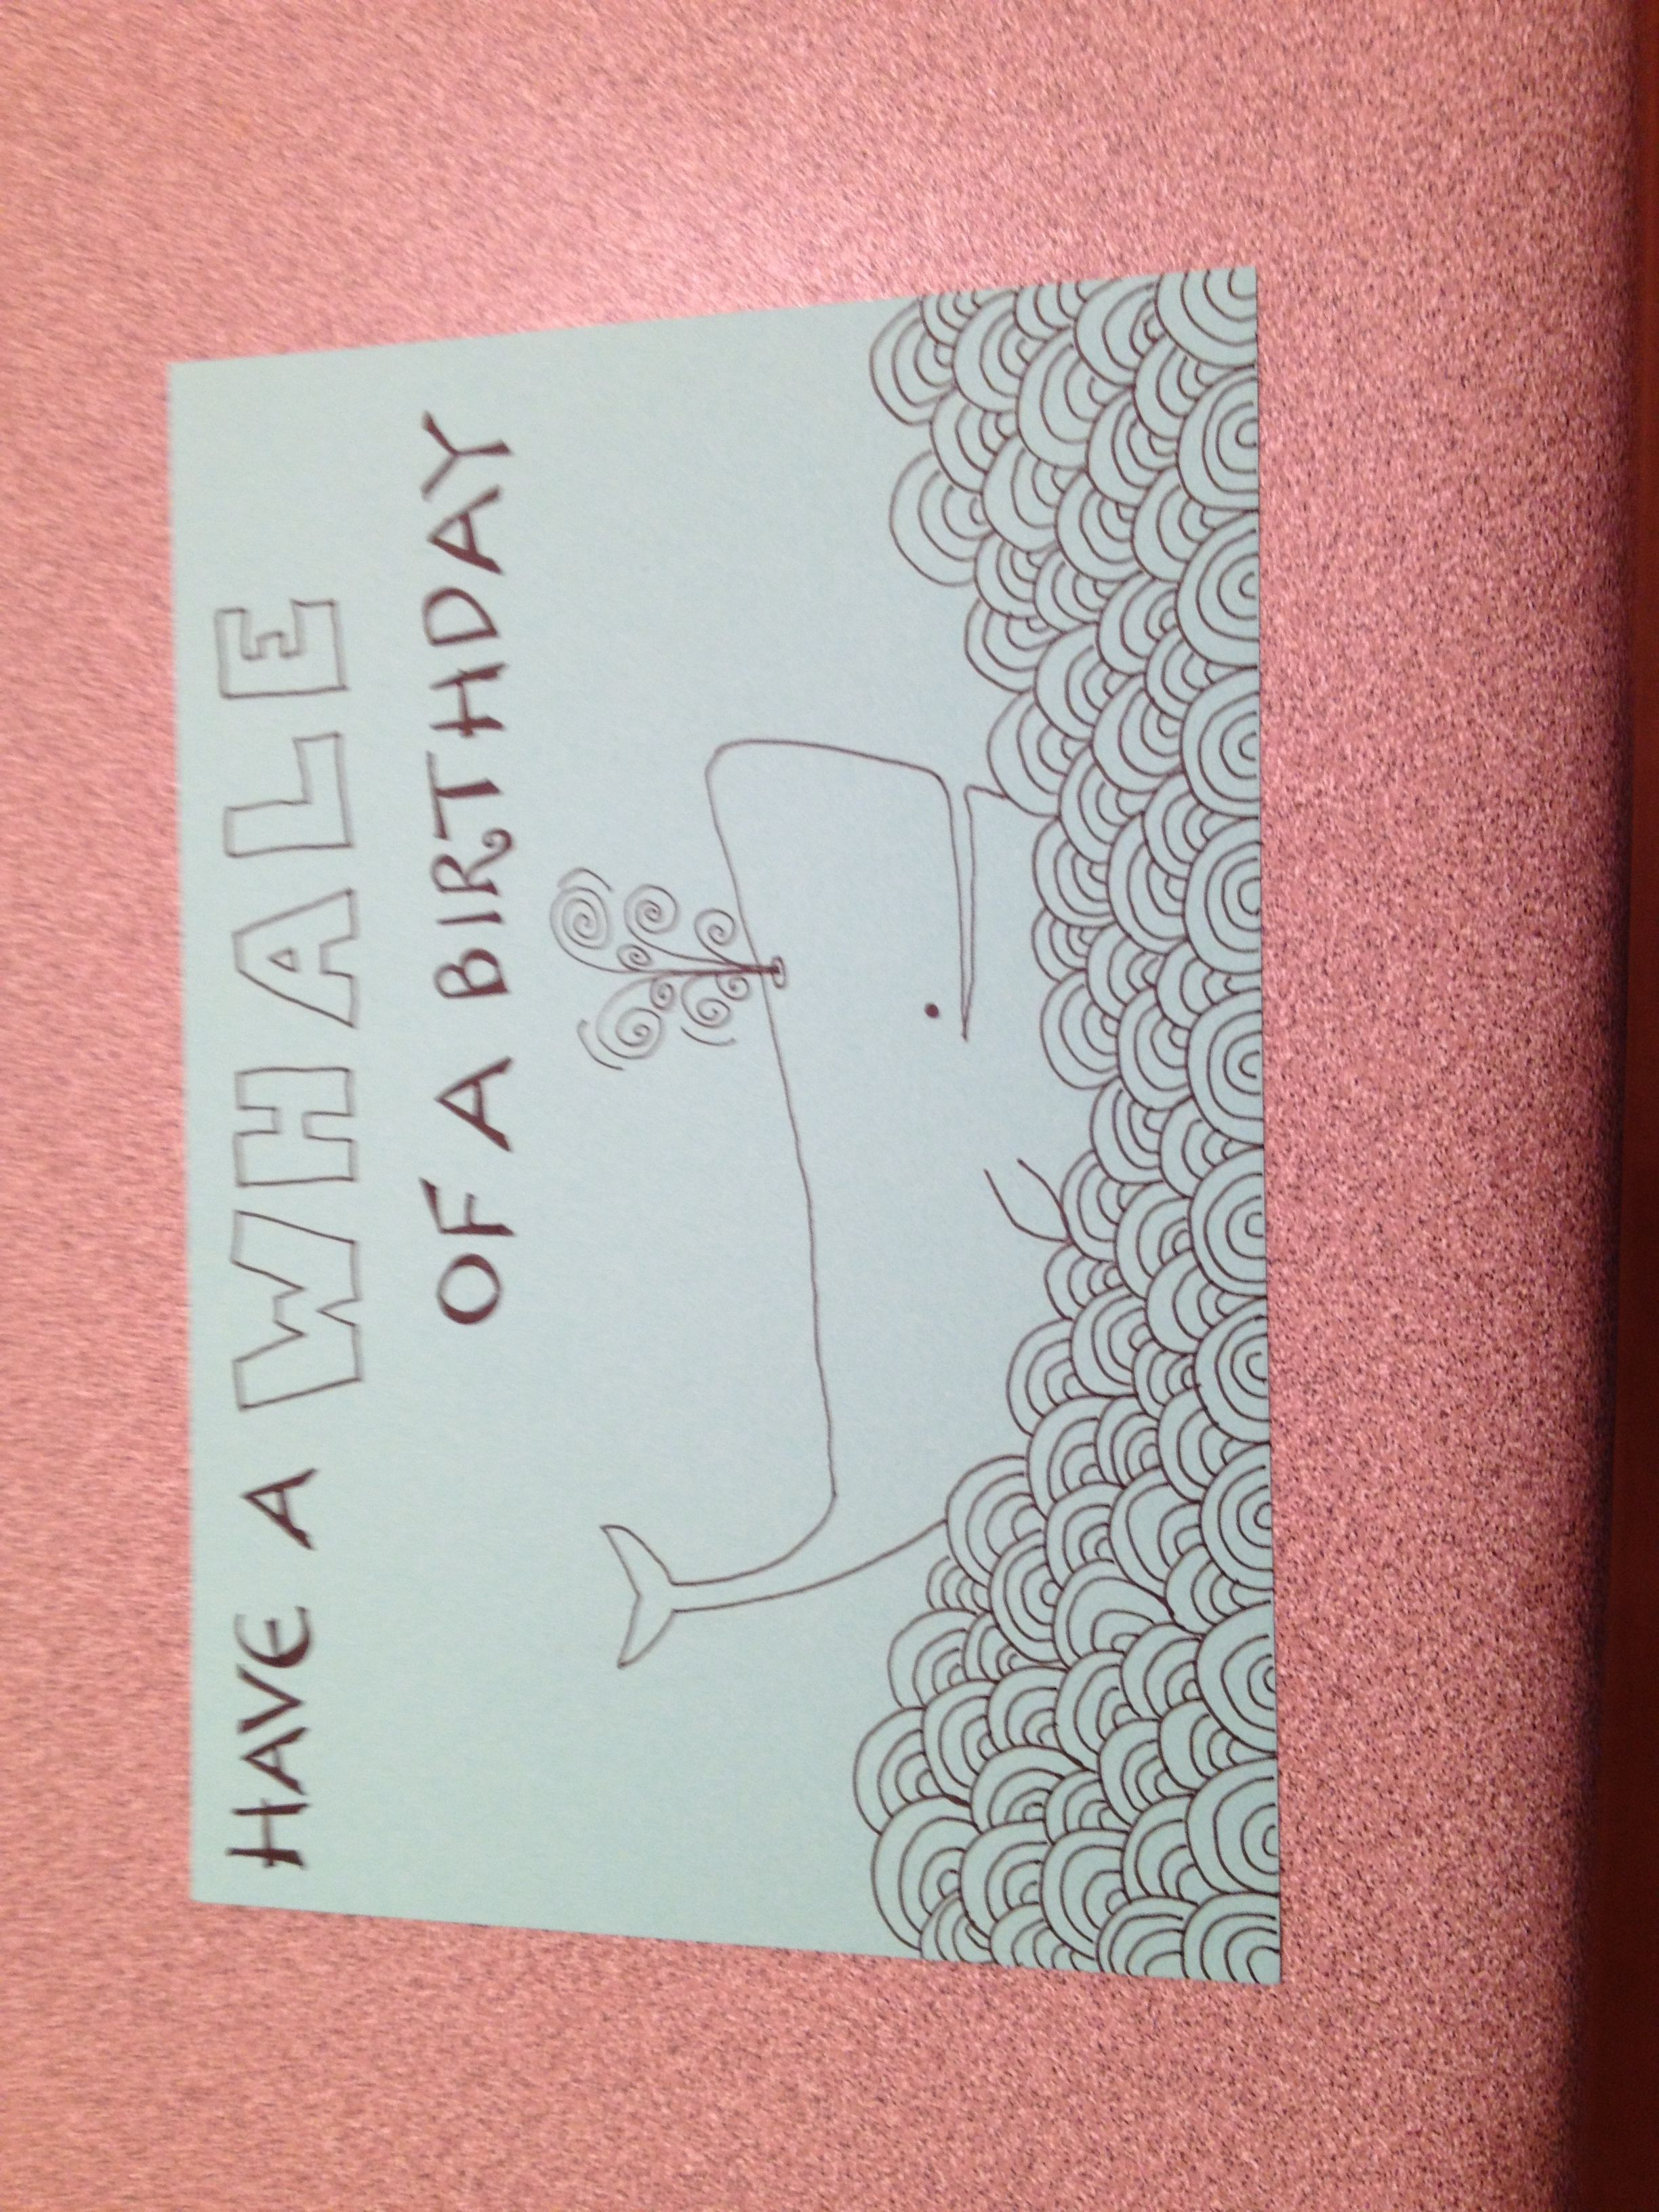 Hand drawn birthday card for my dad Crafts Pinterest